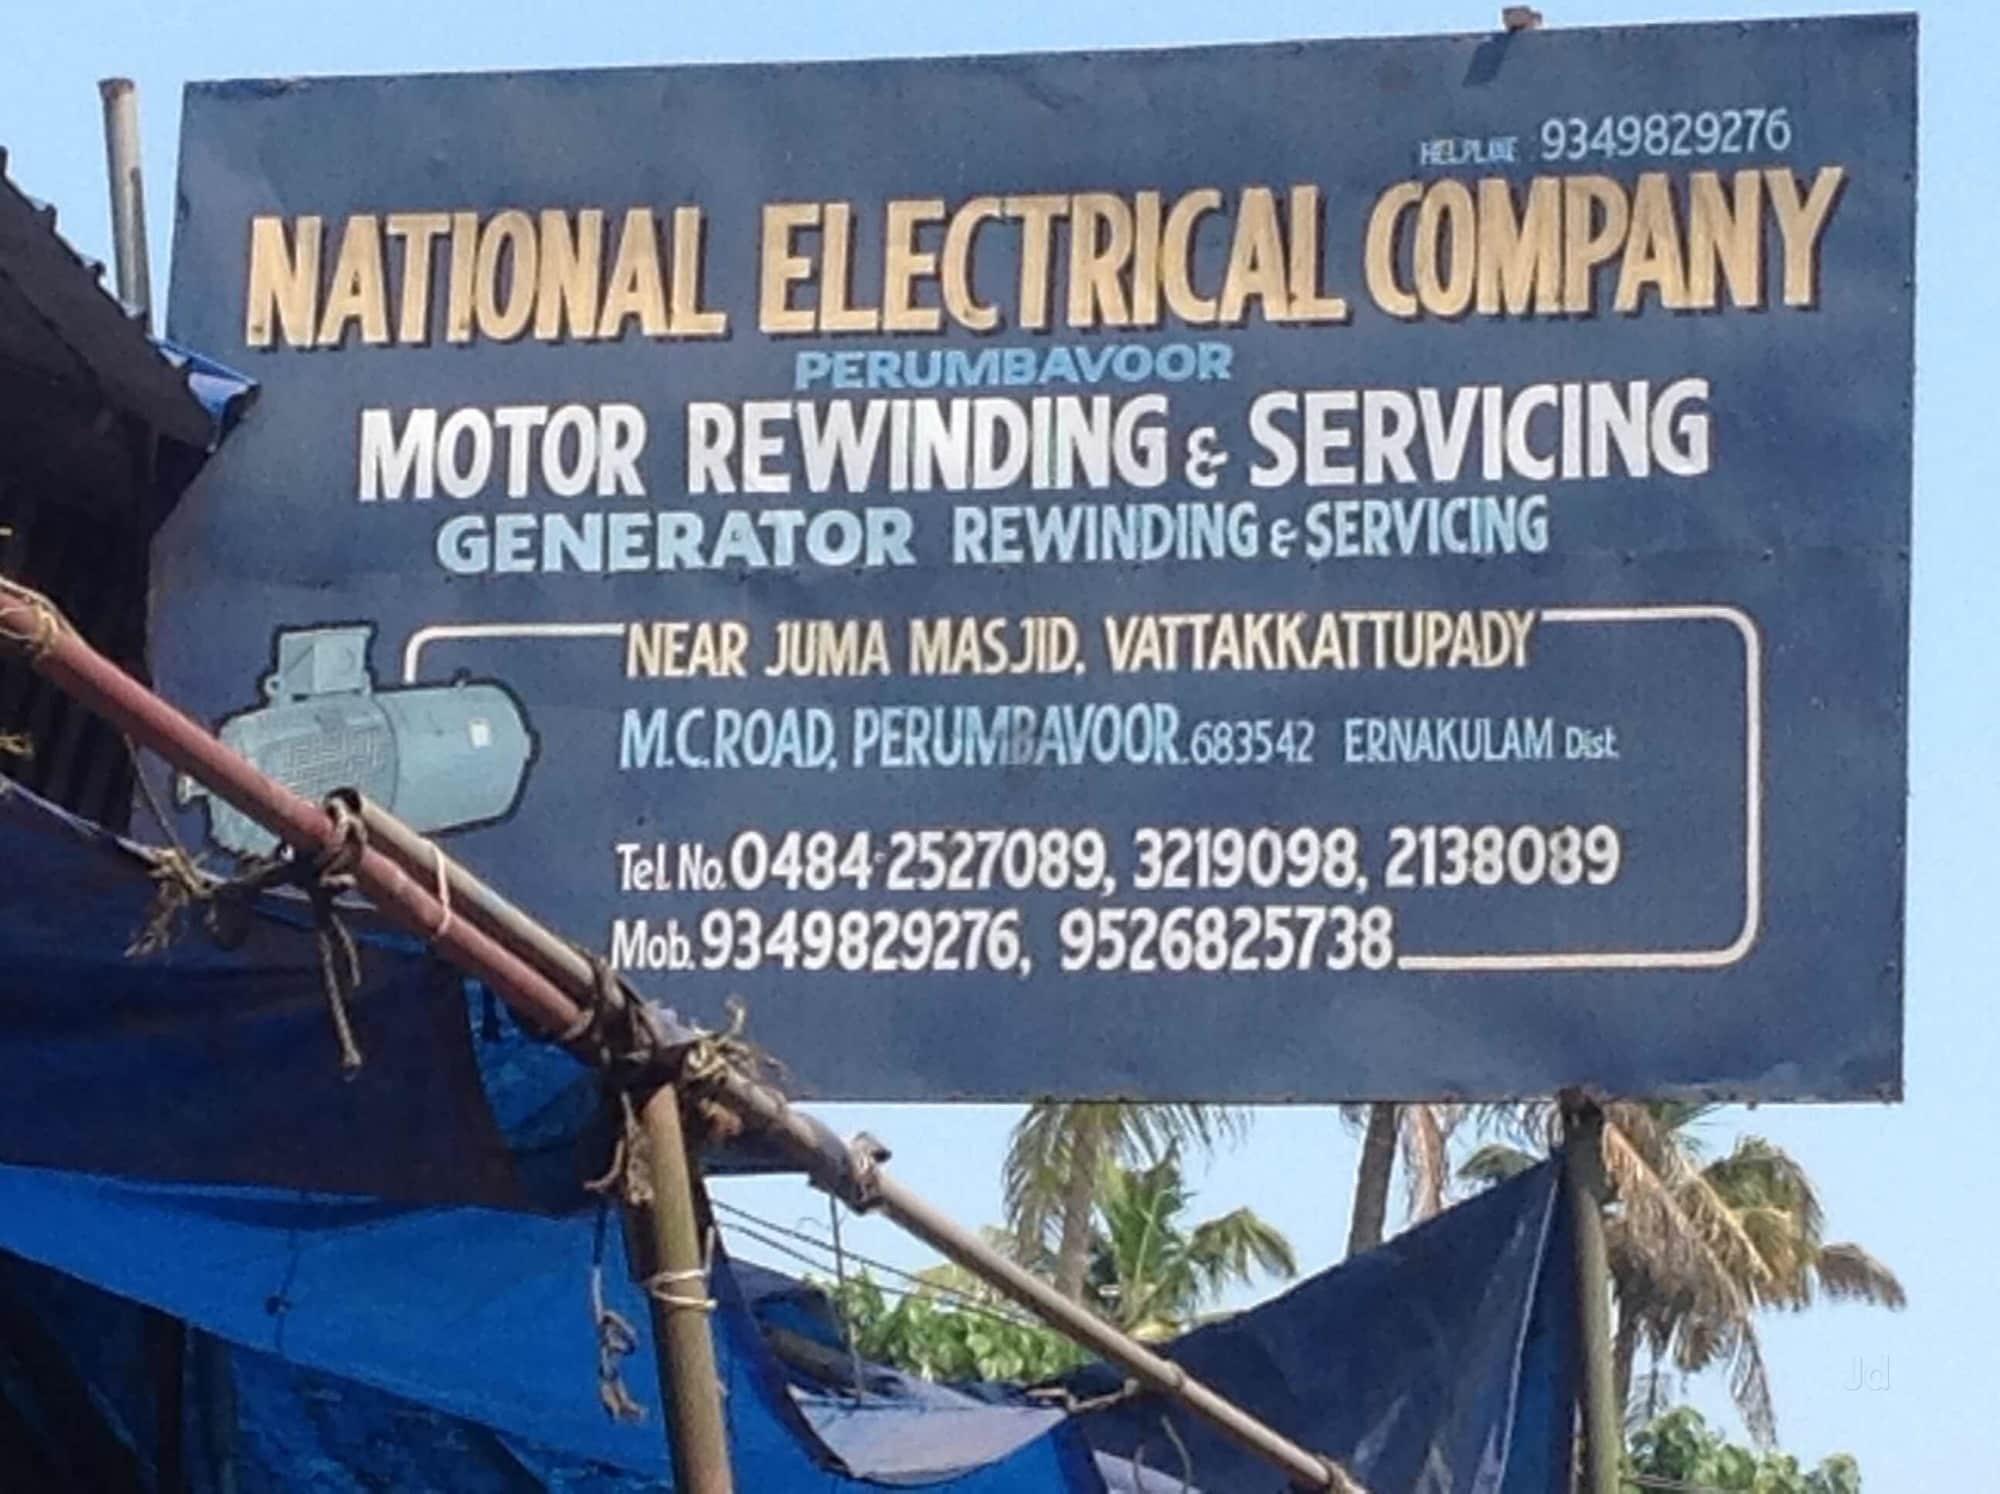 Top Generator Rewinding in Perumbavoor, Ernakulam - Justdial